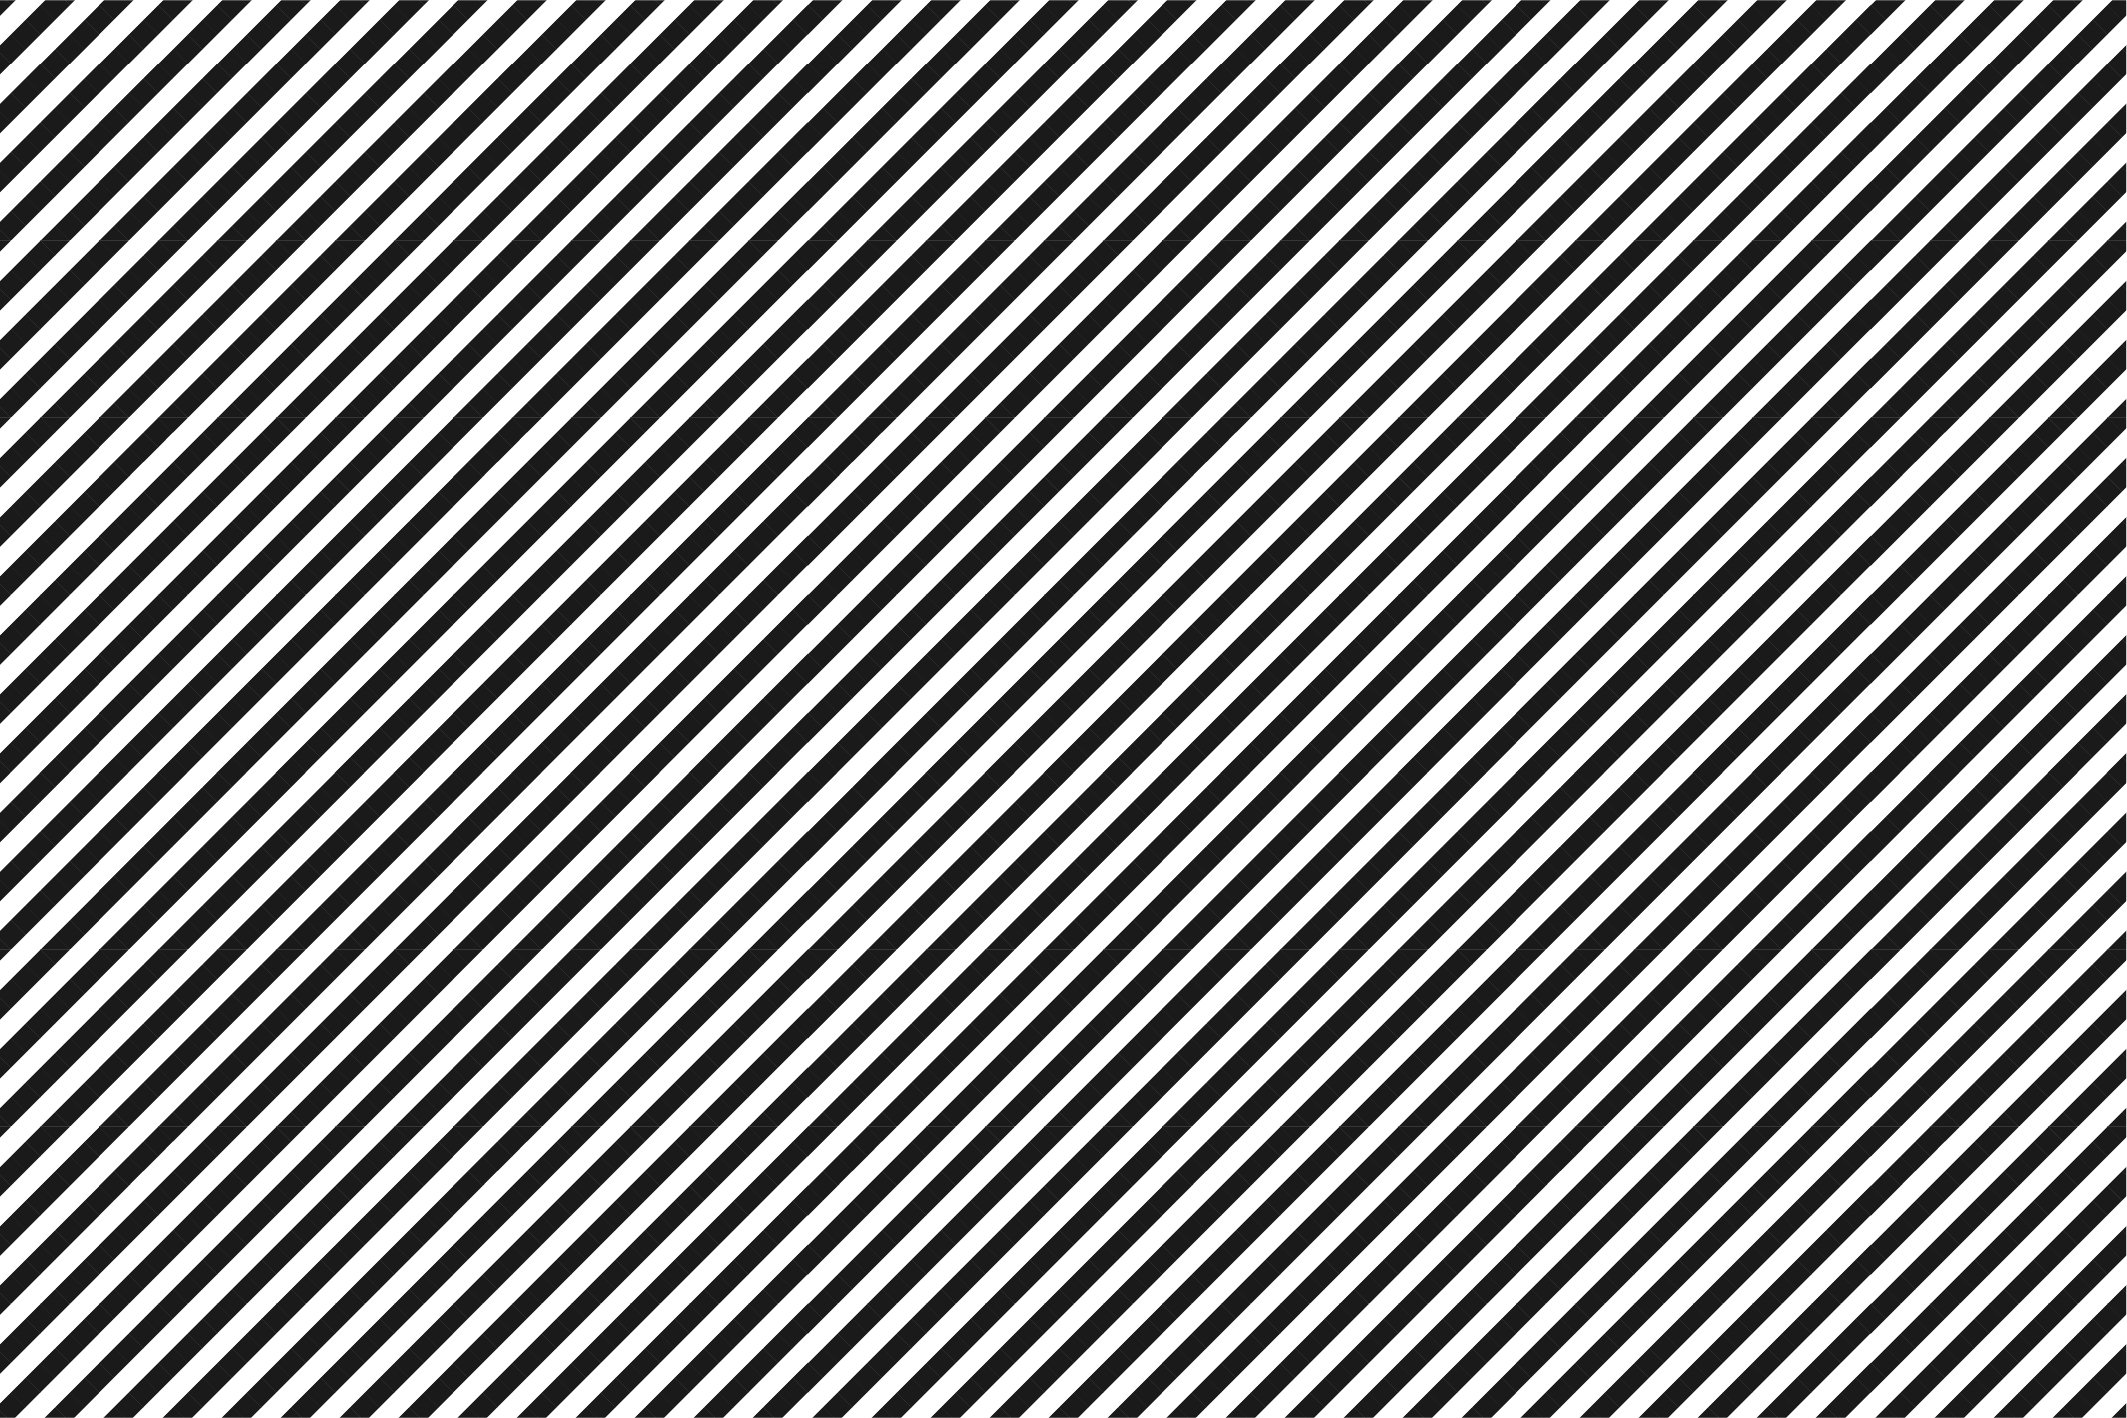 Striped seamless patterns set. example image 6